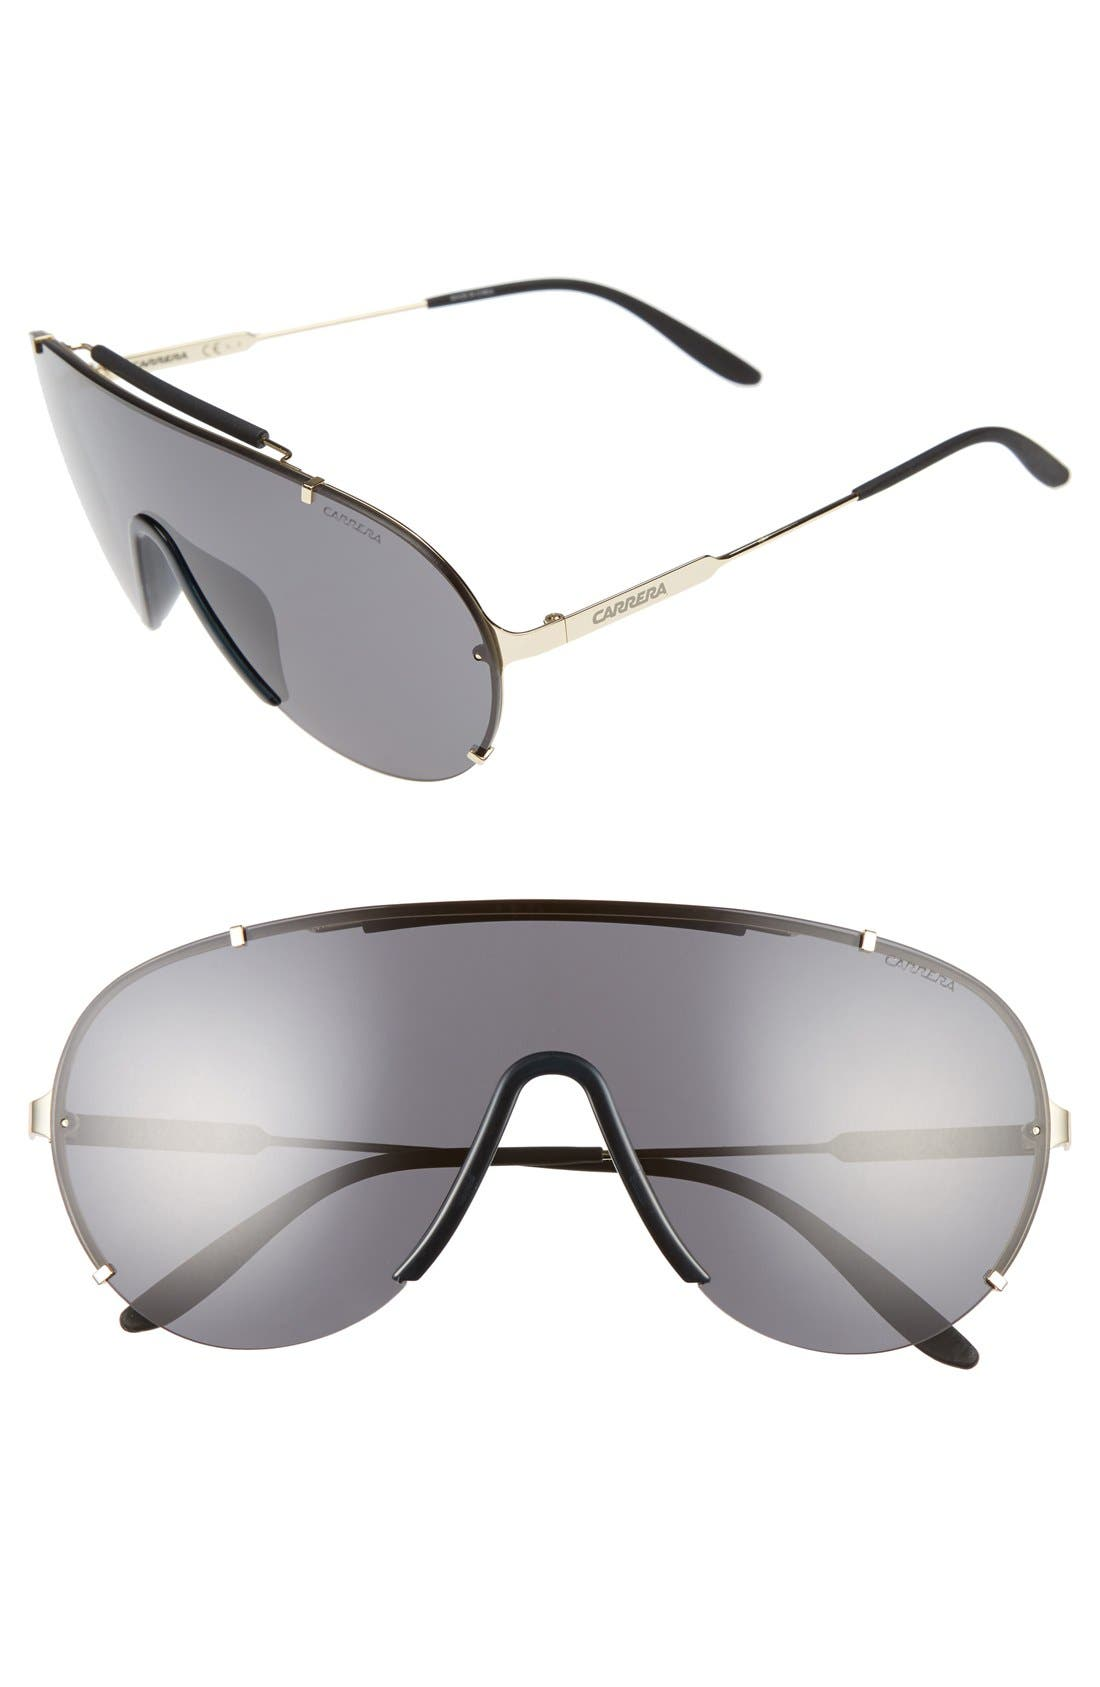 99mm Sunglasses,                             Main thumbnail 1, color,